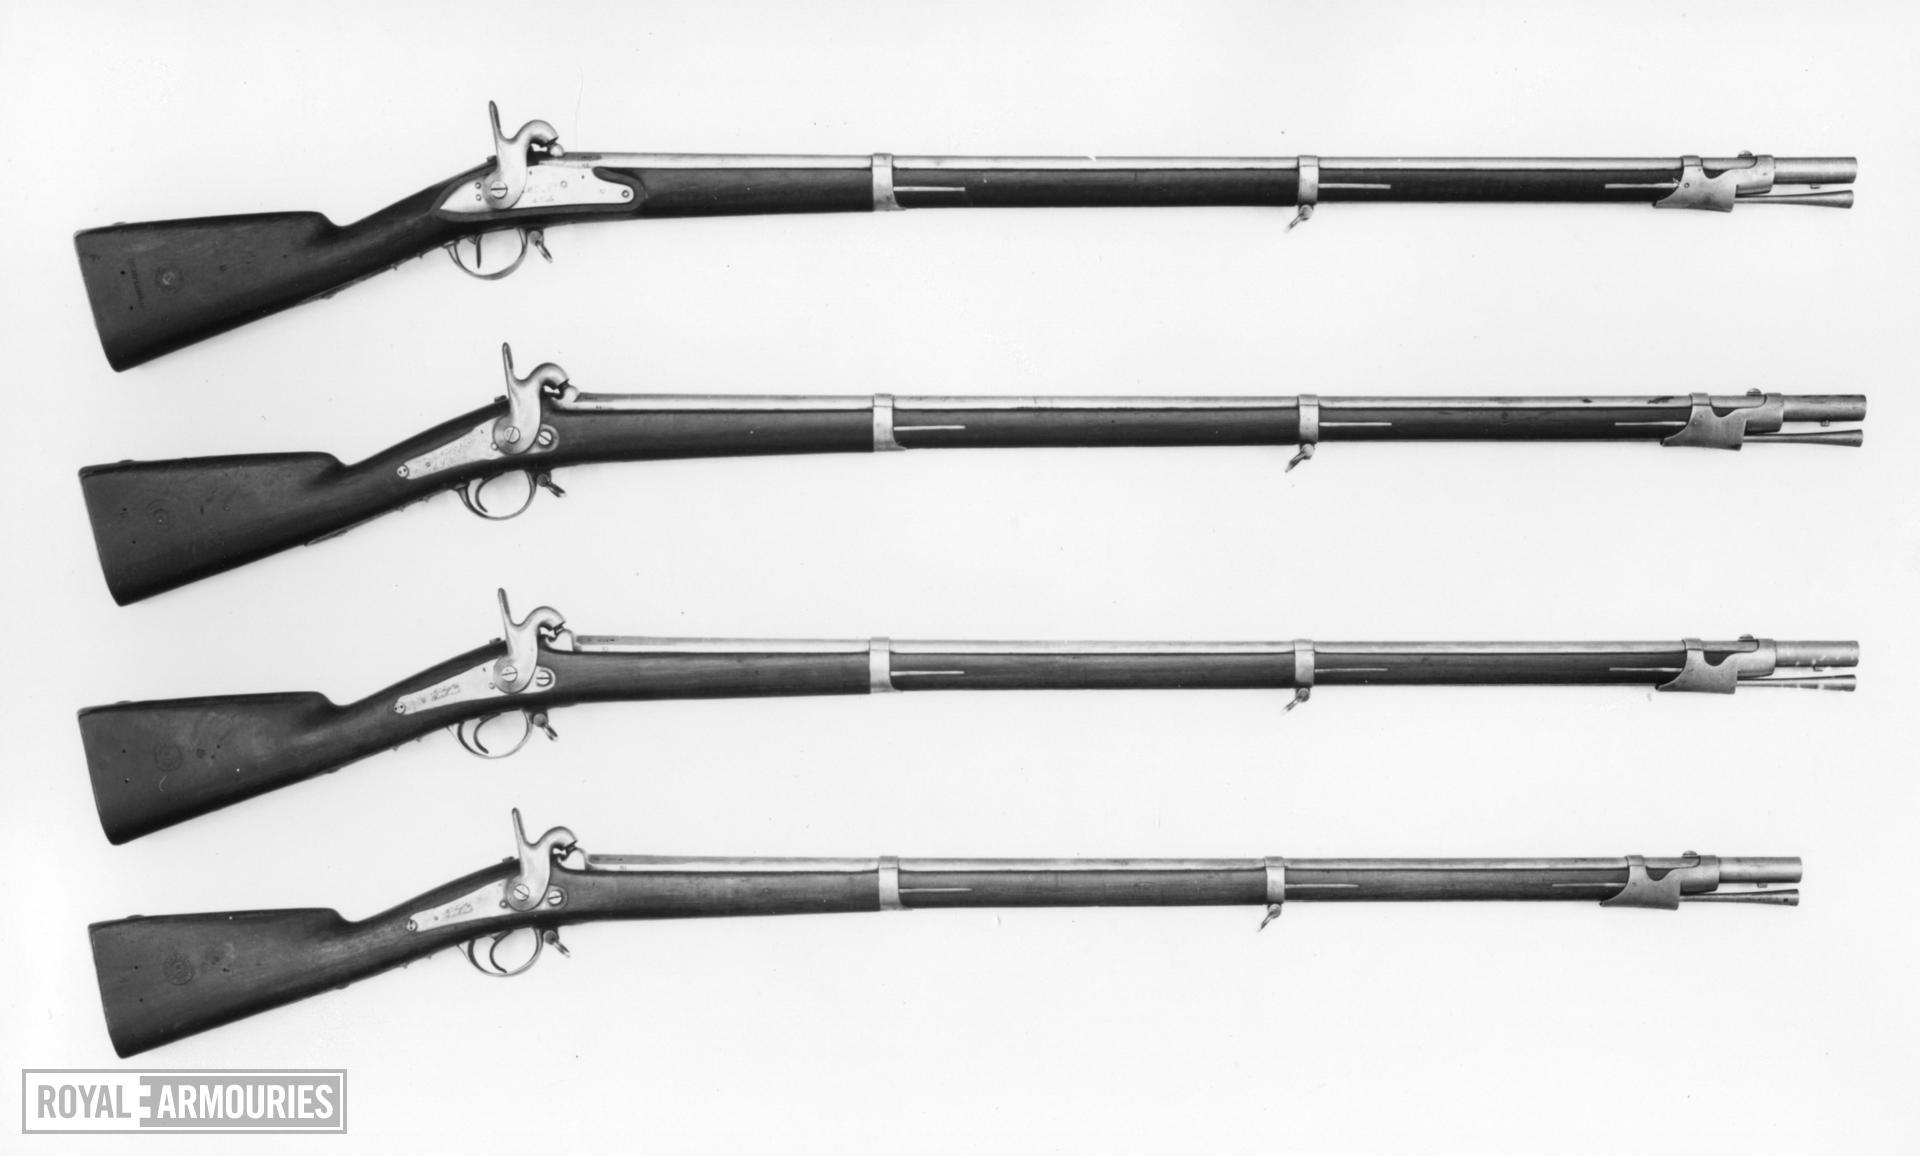 Percussion muzzle-loading military musket - Model 1822